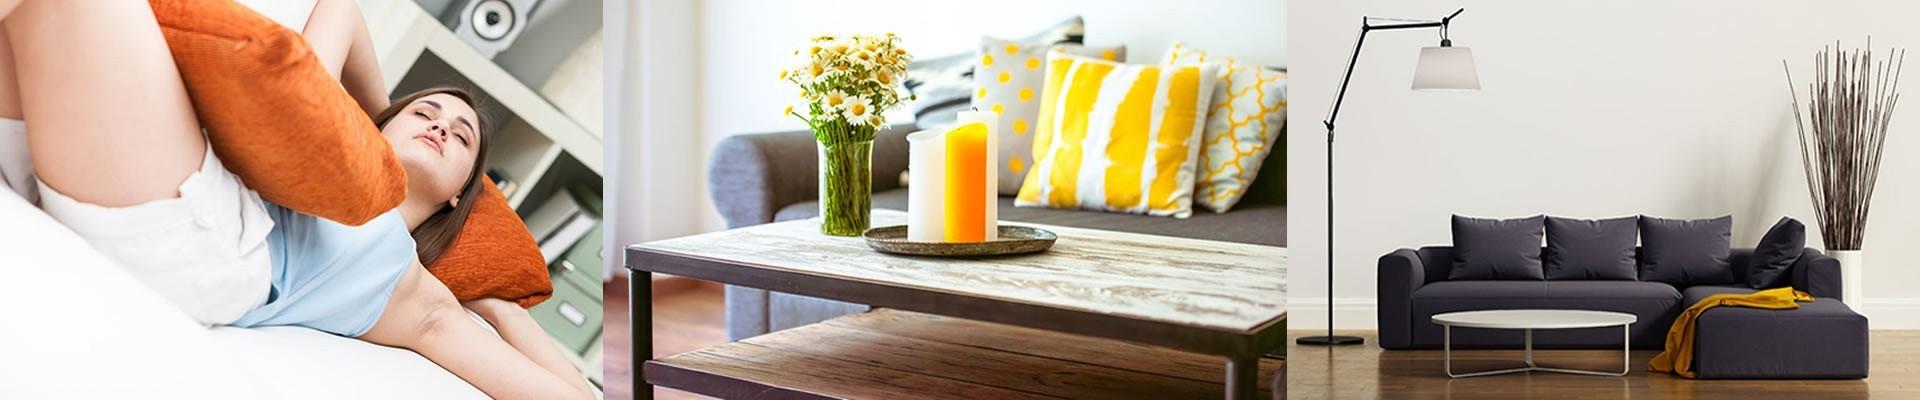 Cushions | Sofa Cushions, Bed Cushions & Many More